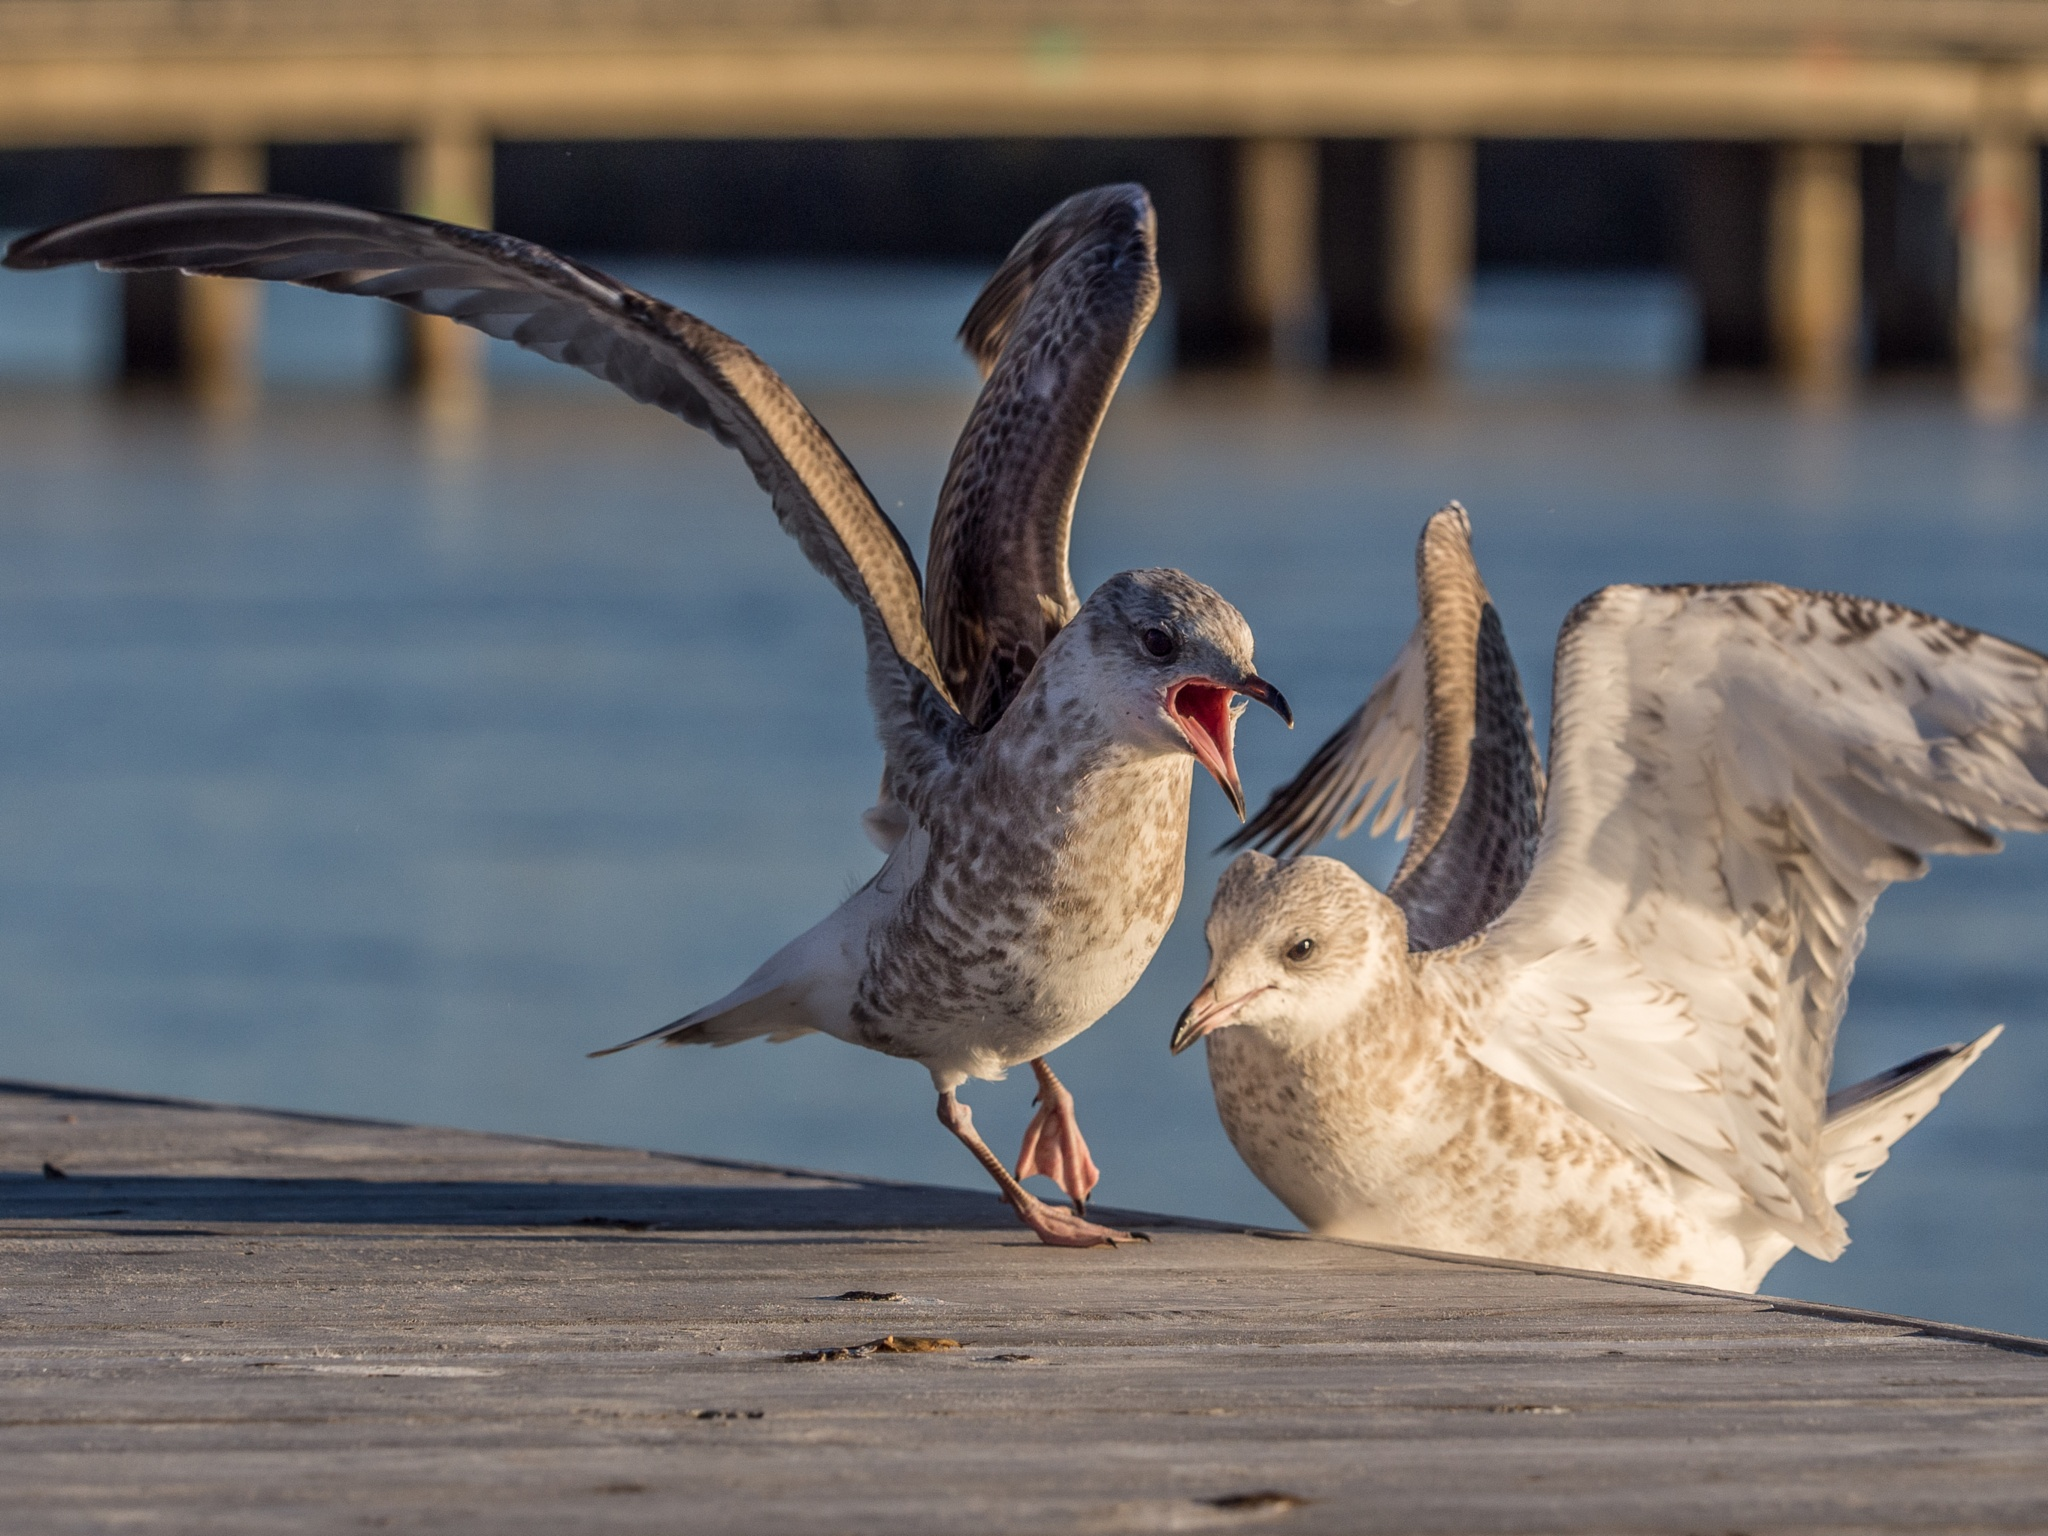 Seagulls by olof.rosenius